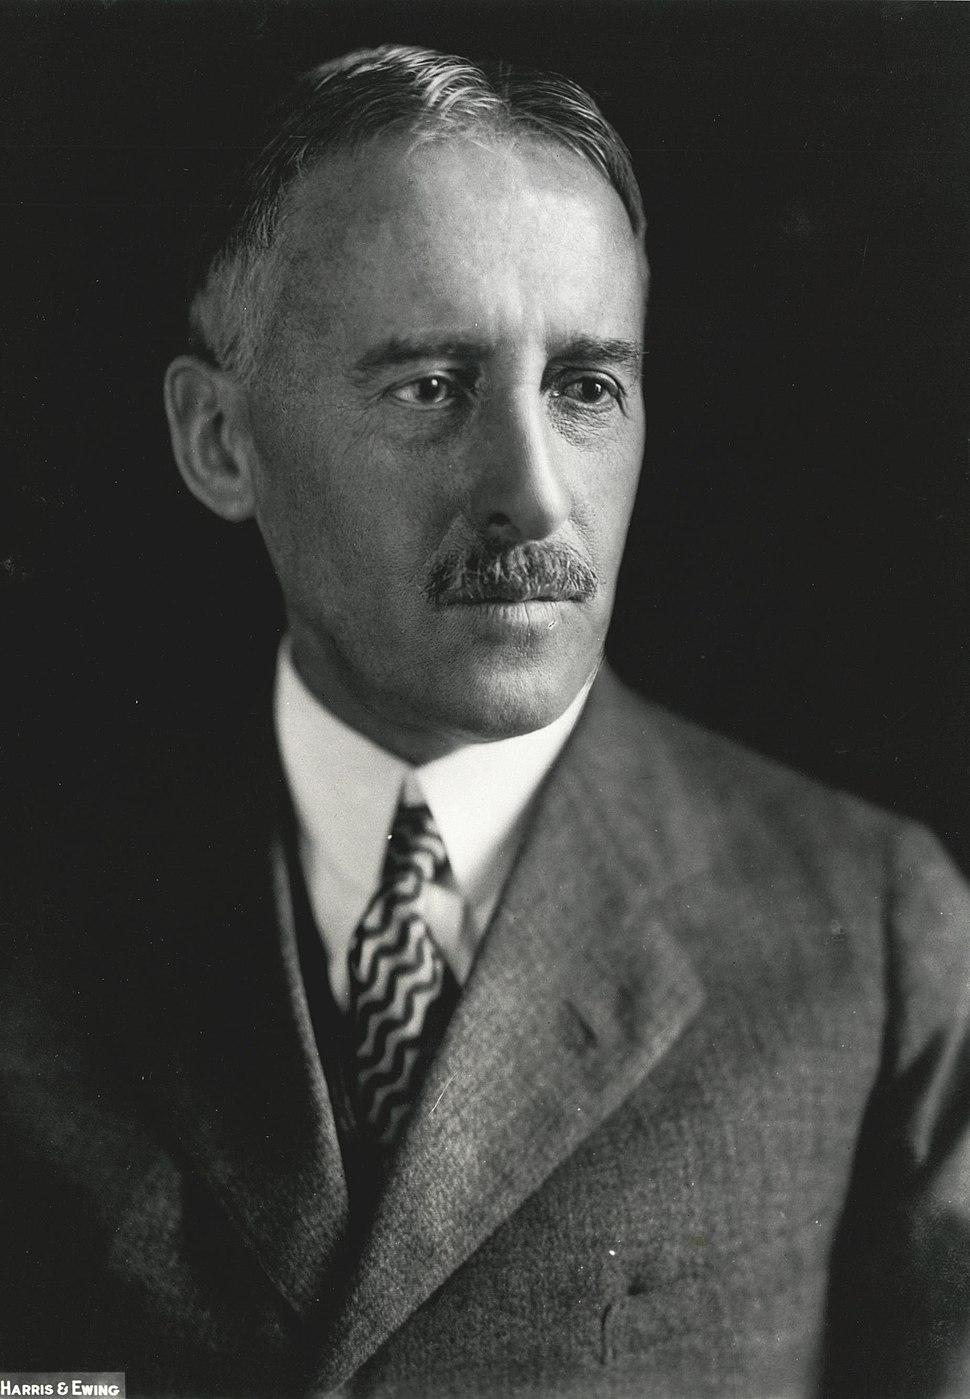 Henry Stimson, Harris & Ewing bw photo portrait, 1929